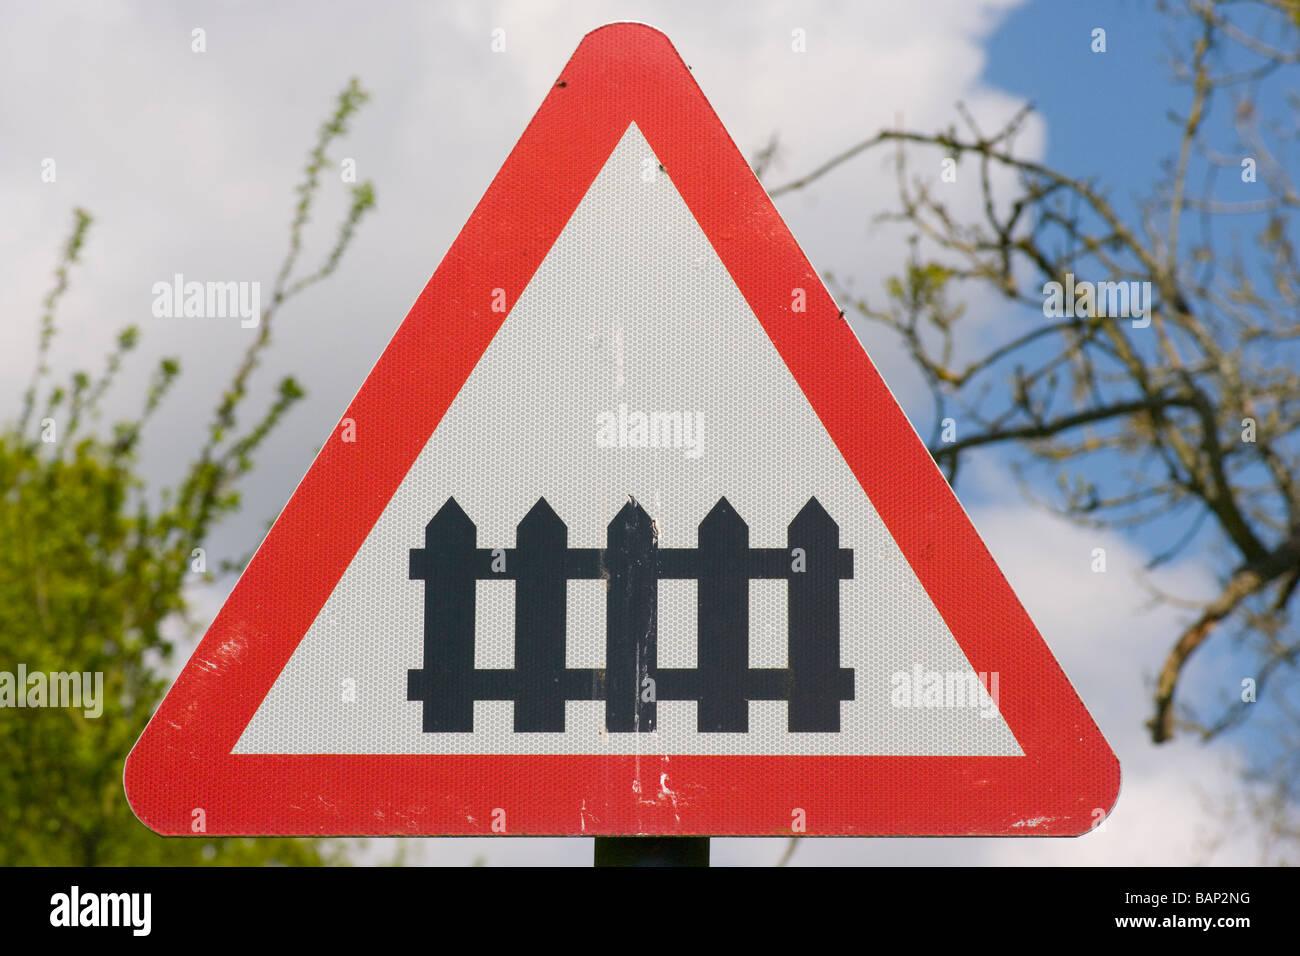 Railway Train Level Crossing uk Road traffic Sign Signs roadsign roadsigns - Stock Image